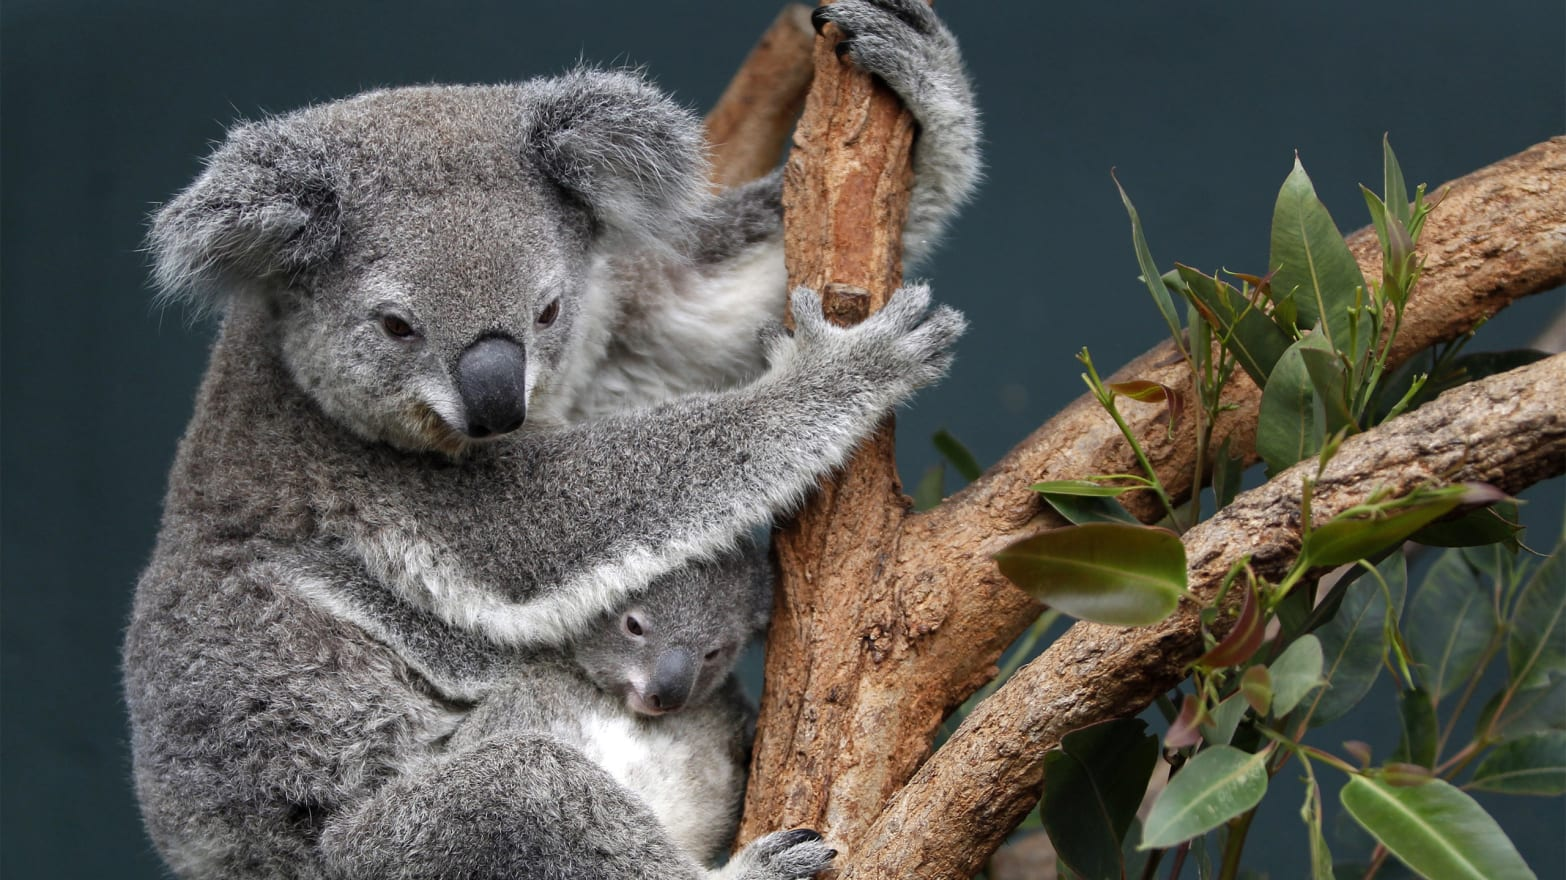 Why Australia Hid Its Koala Mass Murder